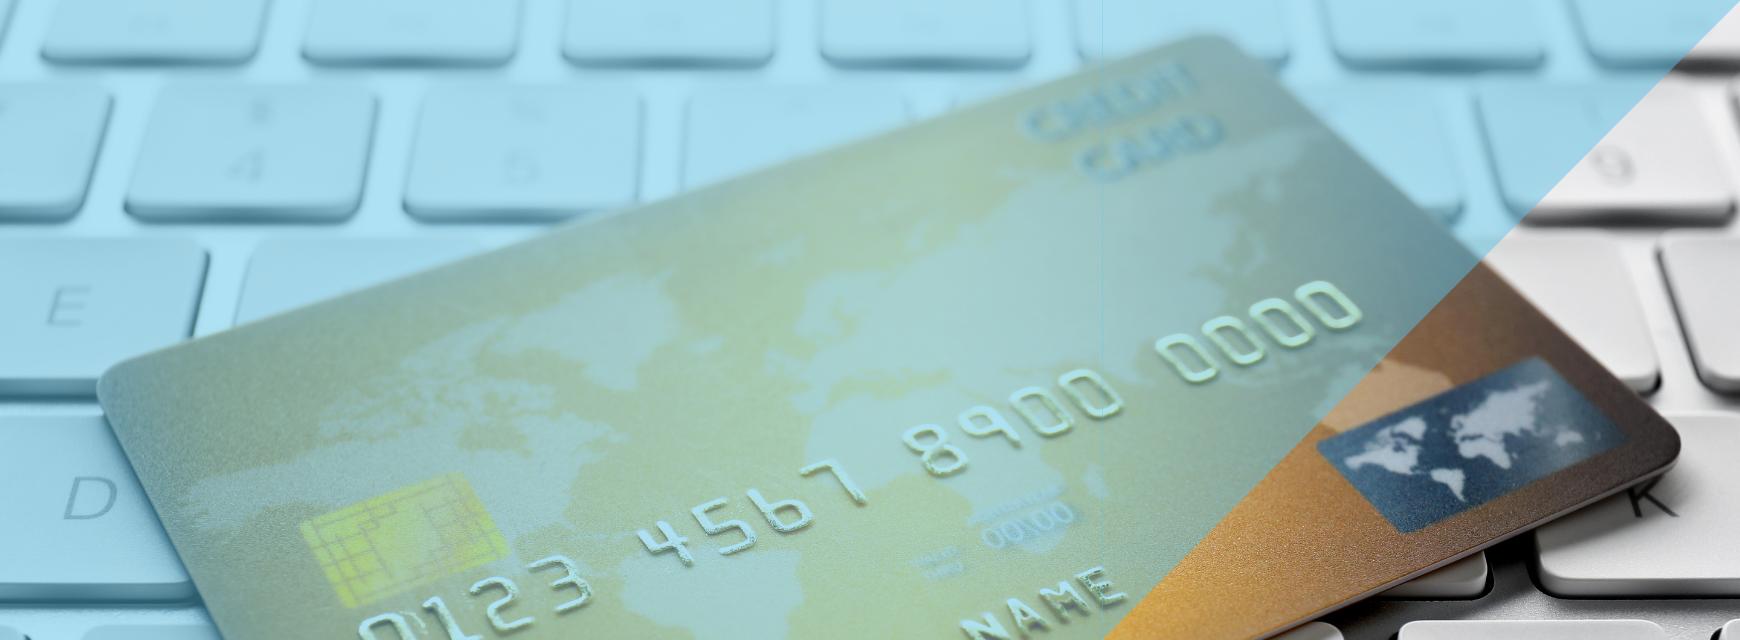 Credit card slice